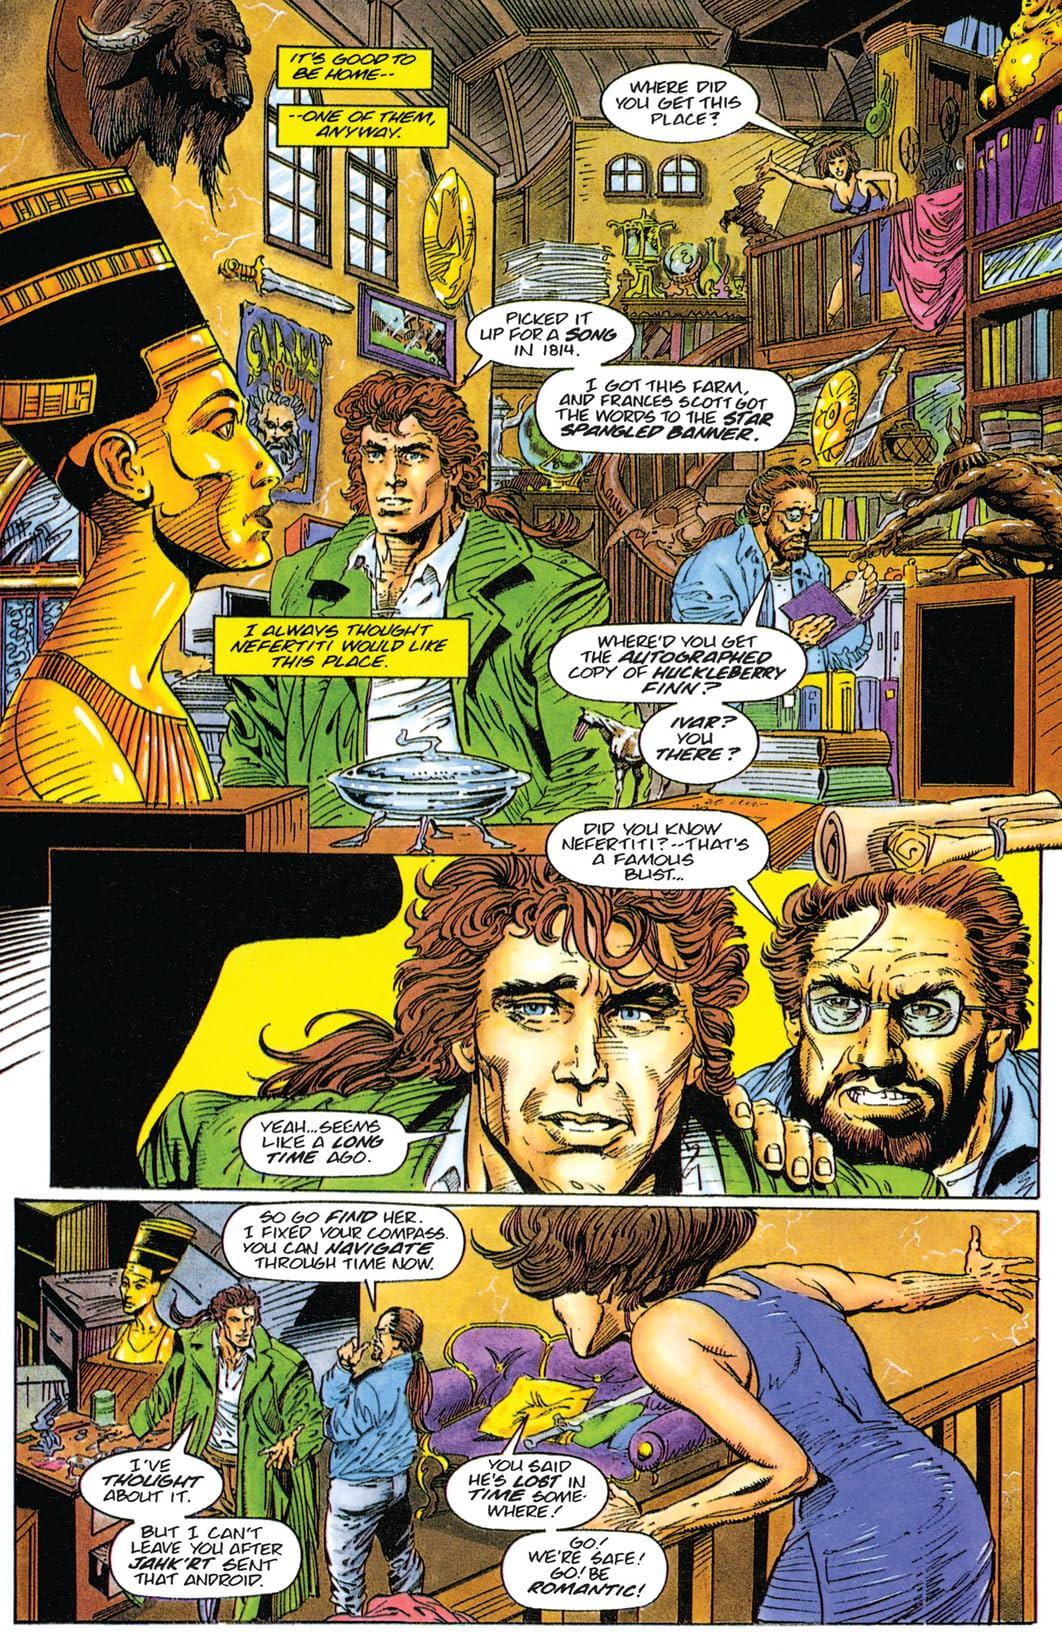 Timewalker (1994) #5